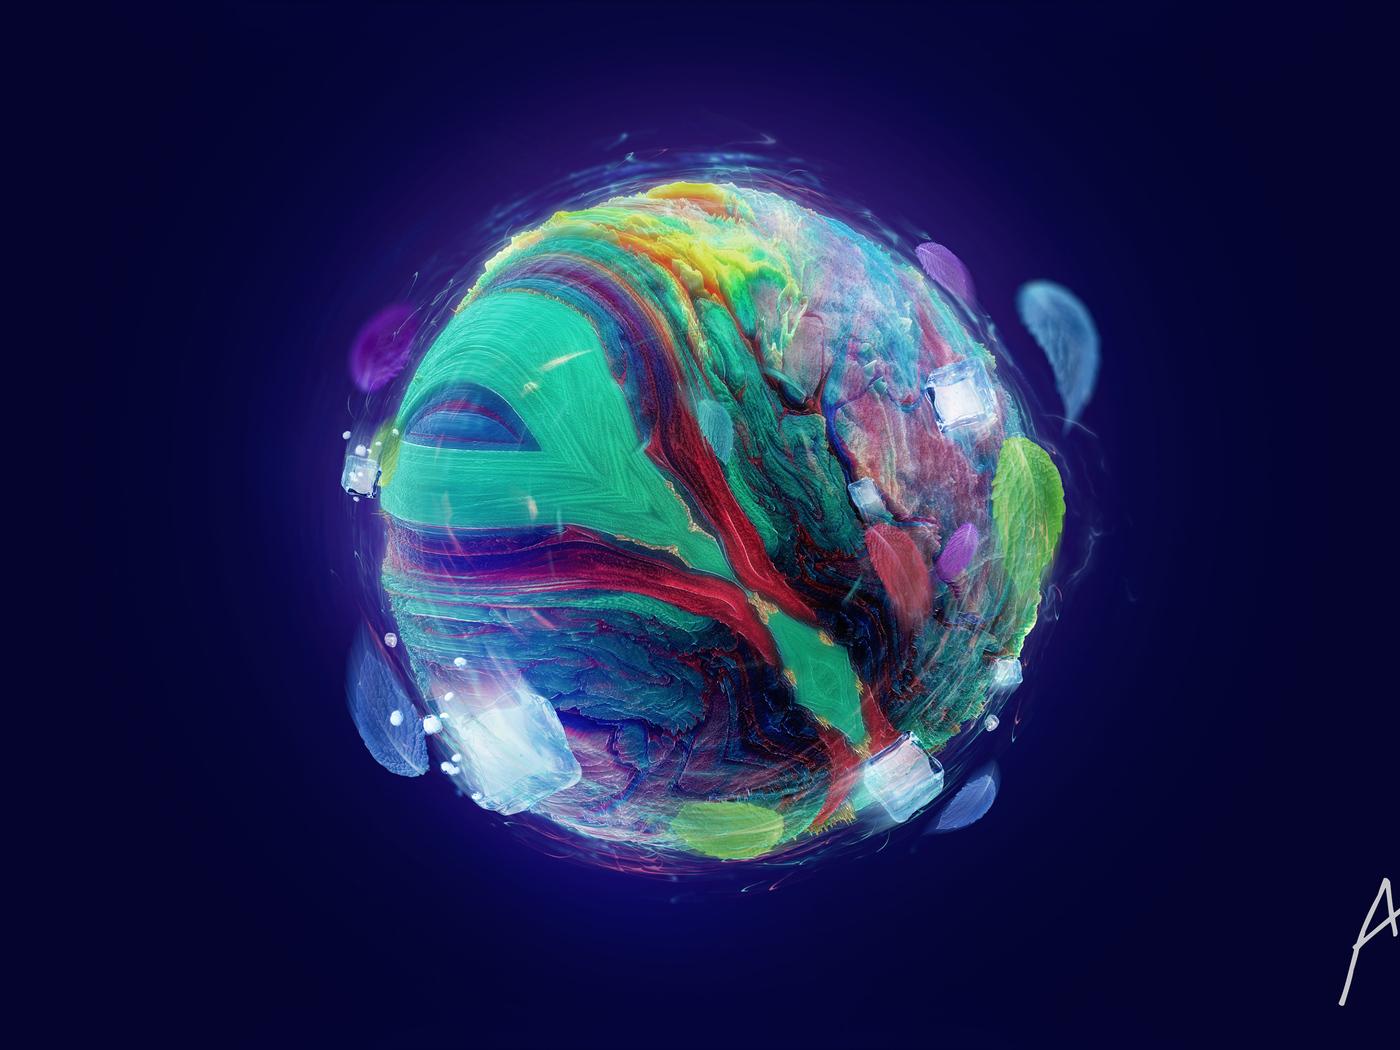 sweet-planet-4k-12.jpg